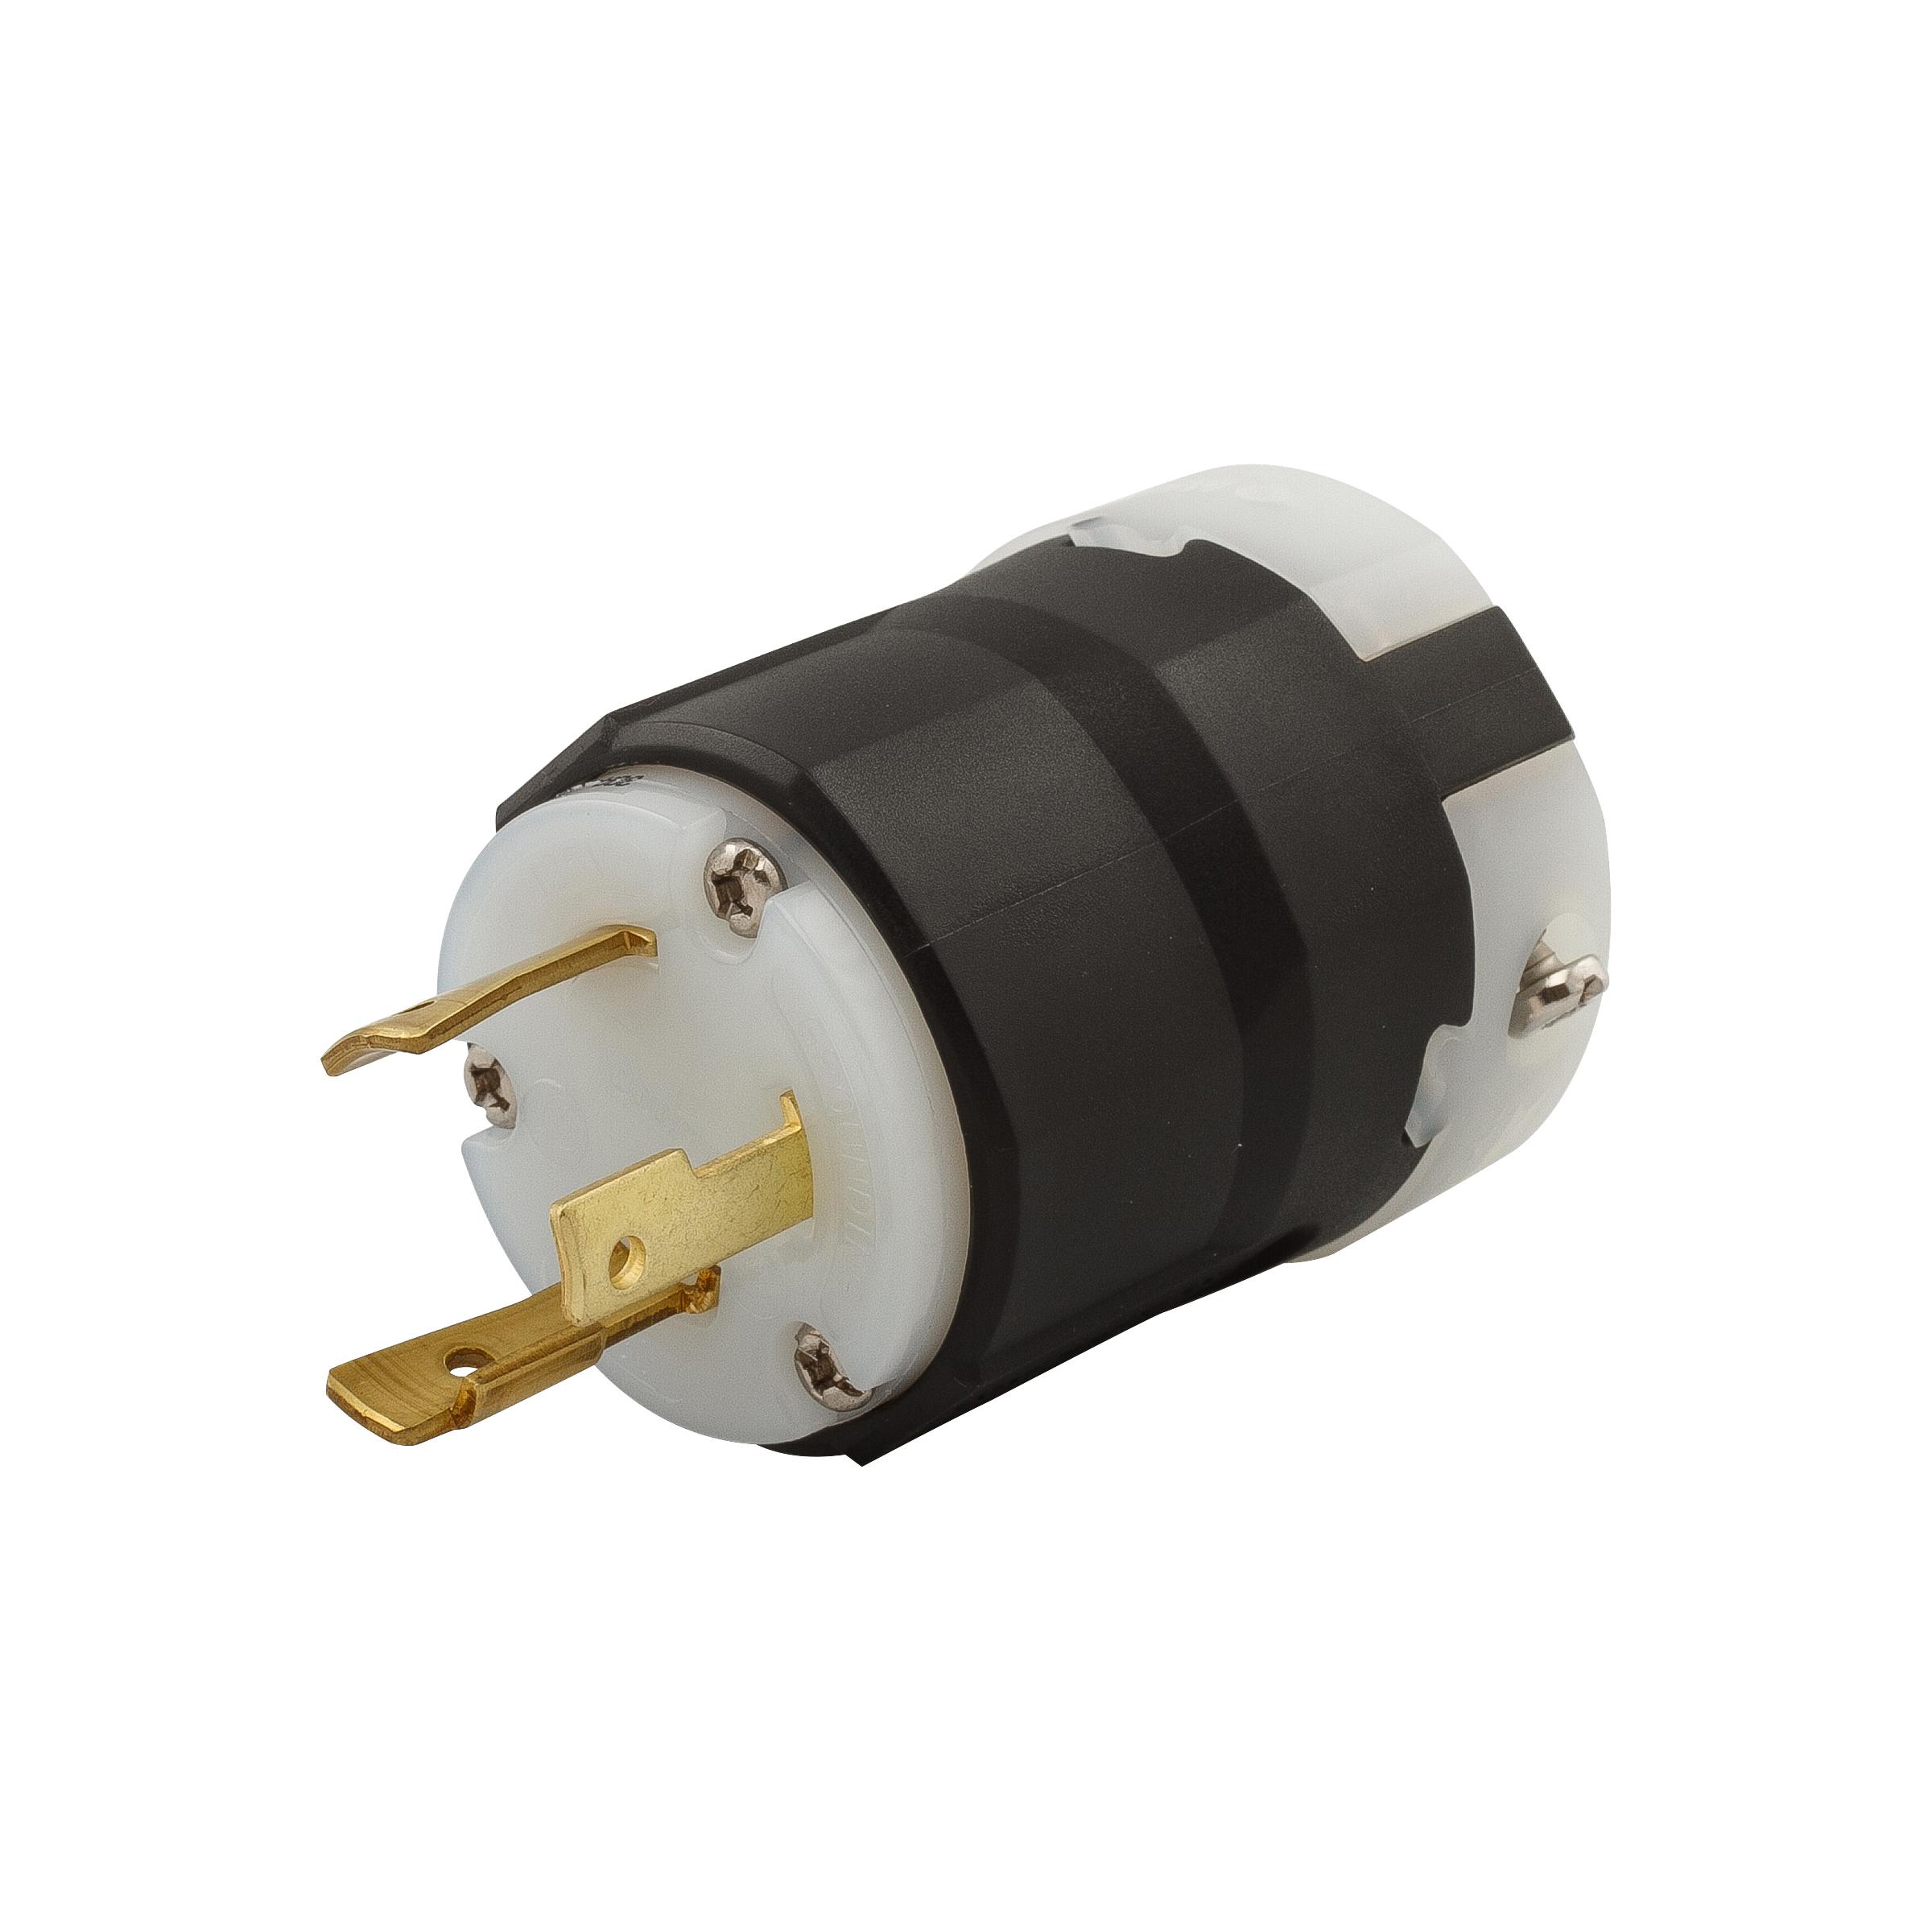 AHL530P_L Nema L V Wiring Diagram on 6-20r receptacle, 17 stepper motor l289n driver, l6-30r, l14-30r, l14-20,